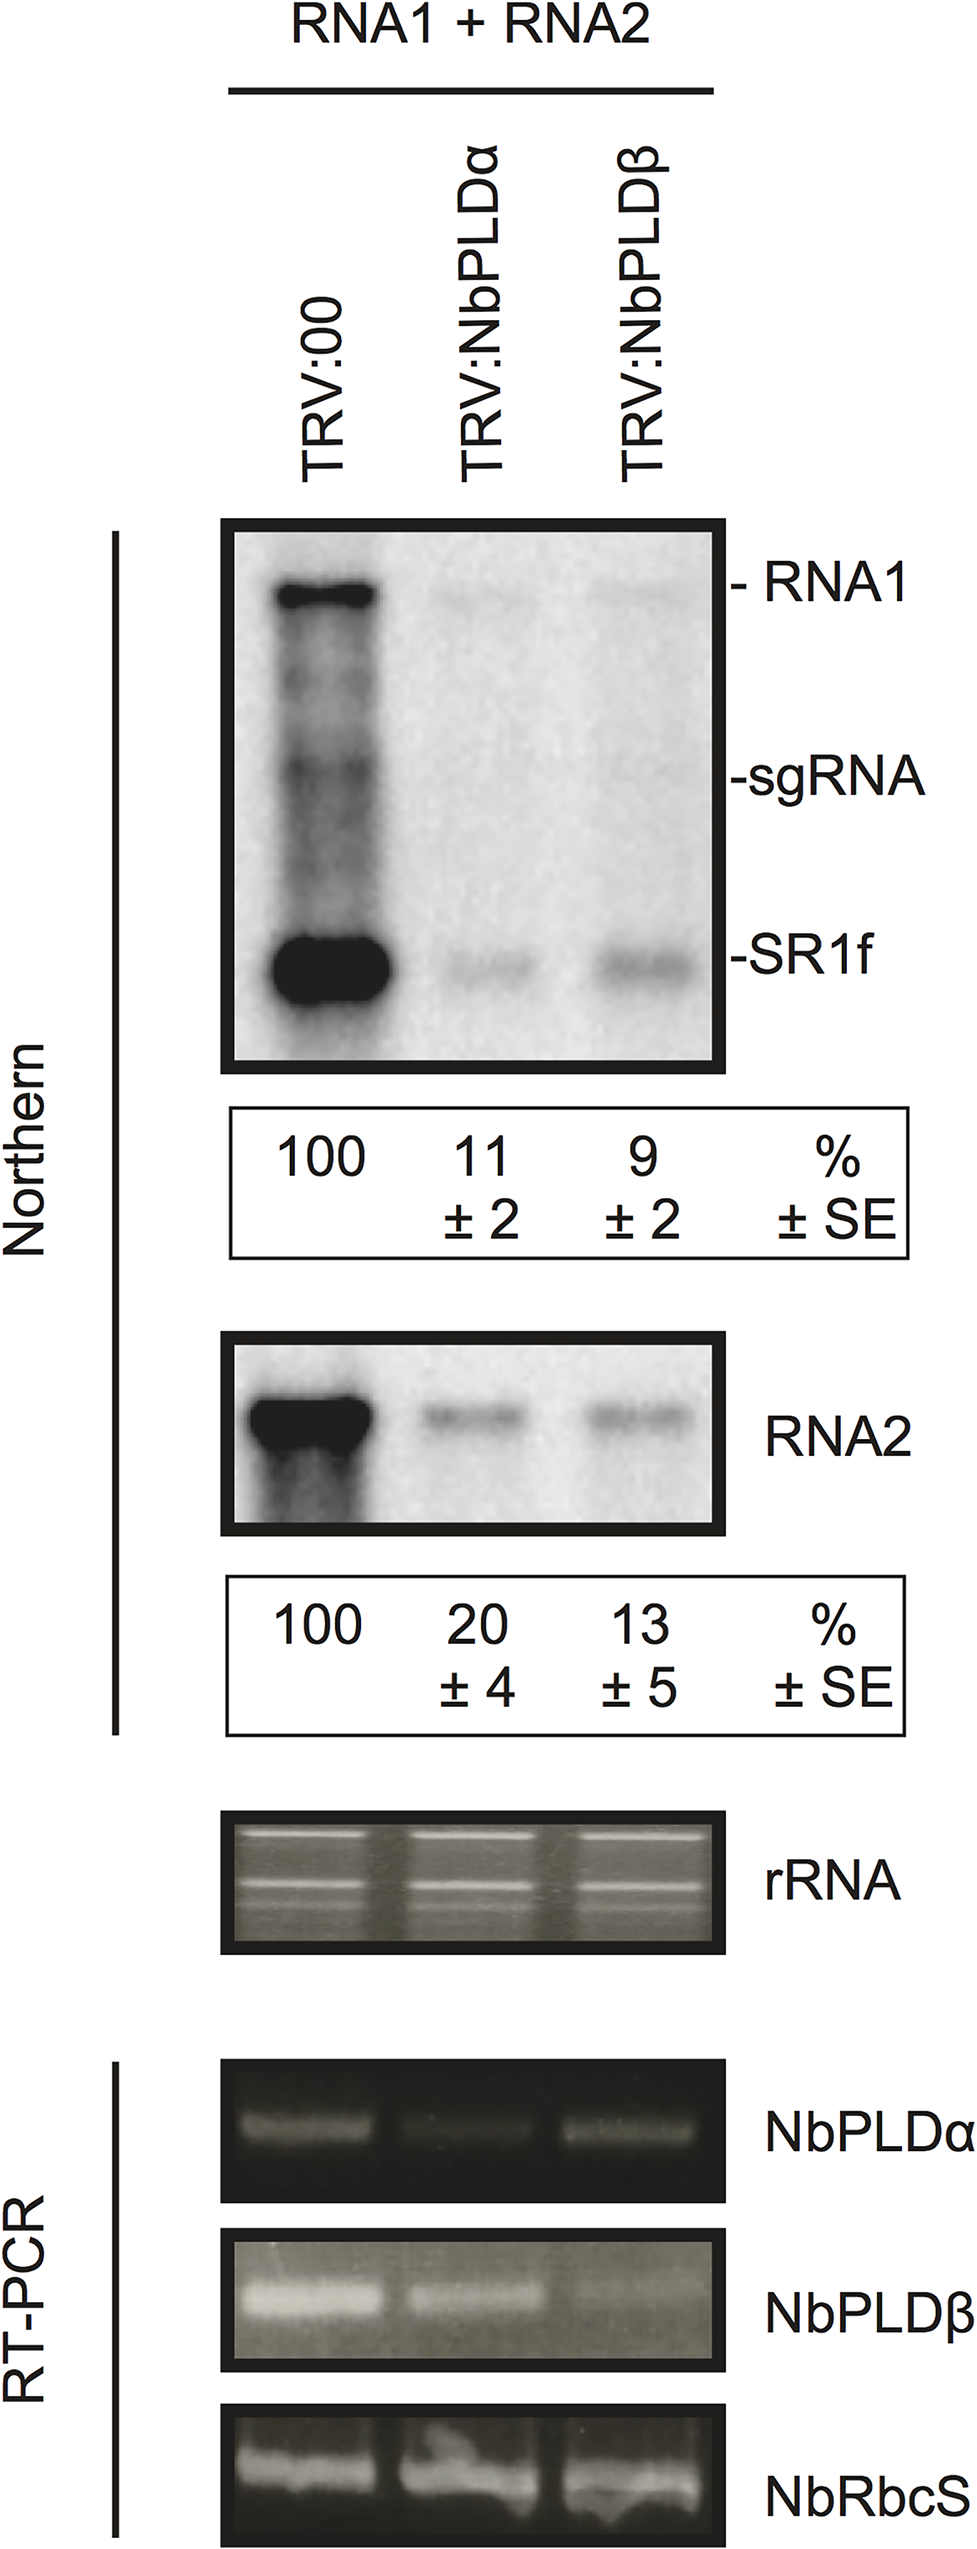 Knockdown of <i>NbPLDα</i> and <i>NbPLDβ</i> mRNAs levels via gene silencing inhibits the accumulation of RCNMV RNAs in <i>N</i>. <i>benthamiana</i>.